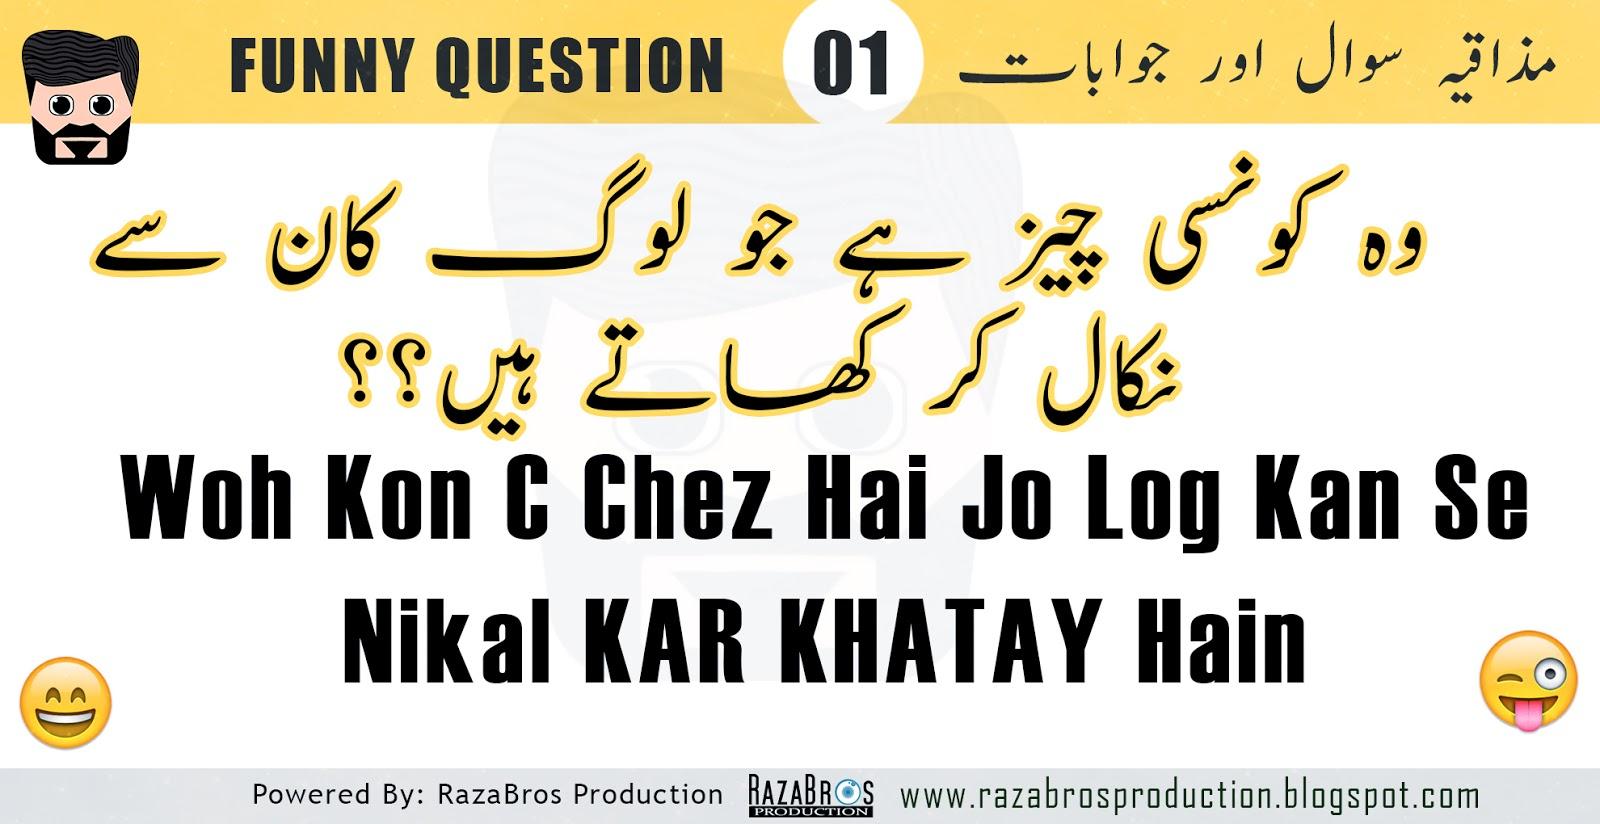 Urdu Funny Jawab Talab Sawal | Funny Questions With Answers - Raza